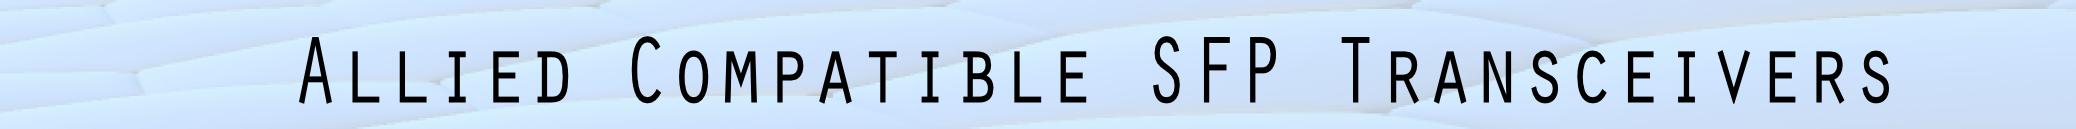 Allied Gigabit Ethernet Fiber Optical SFP Transceiver Modules